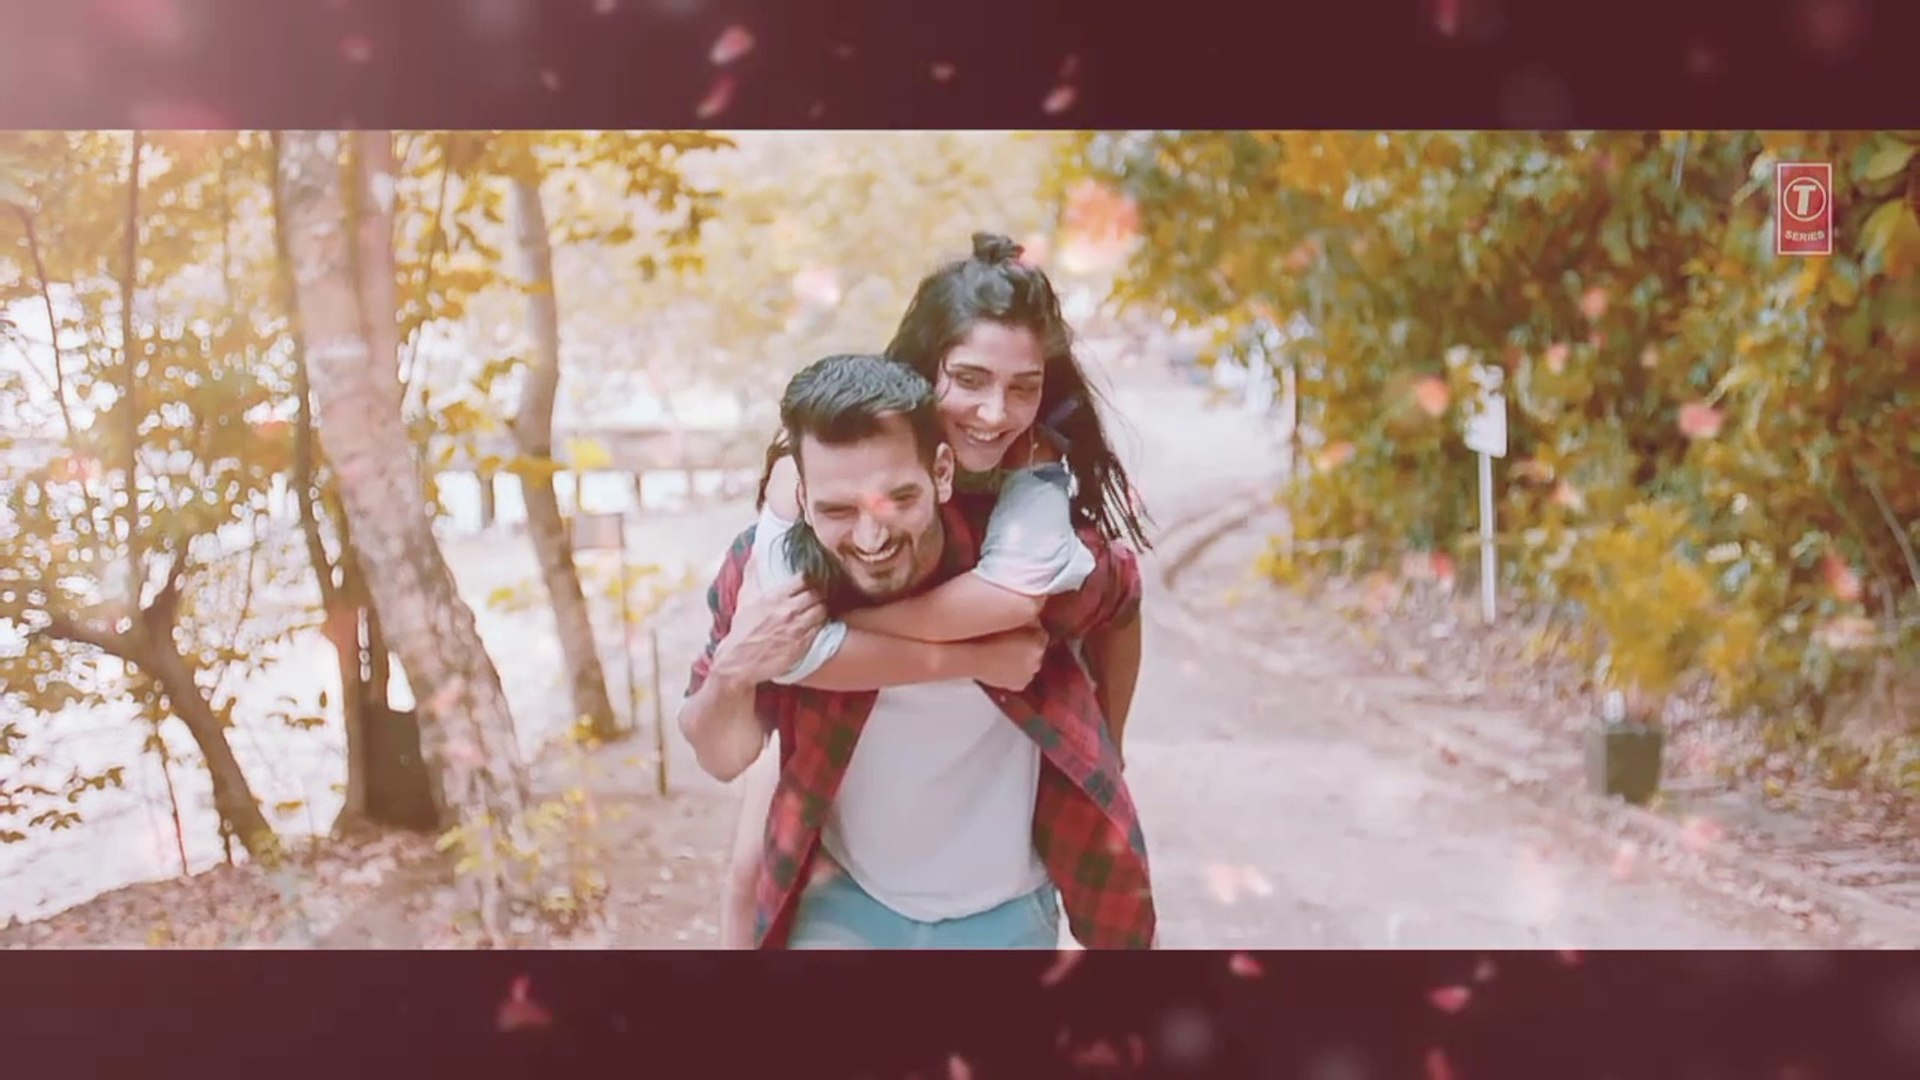 ik vaari aa full song | bollywood full video song in hindi | short love story in hindi